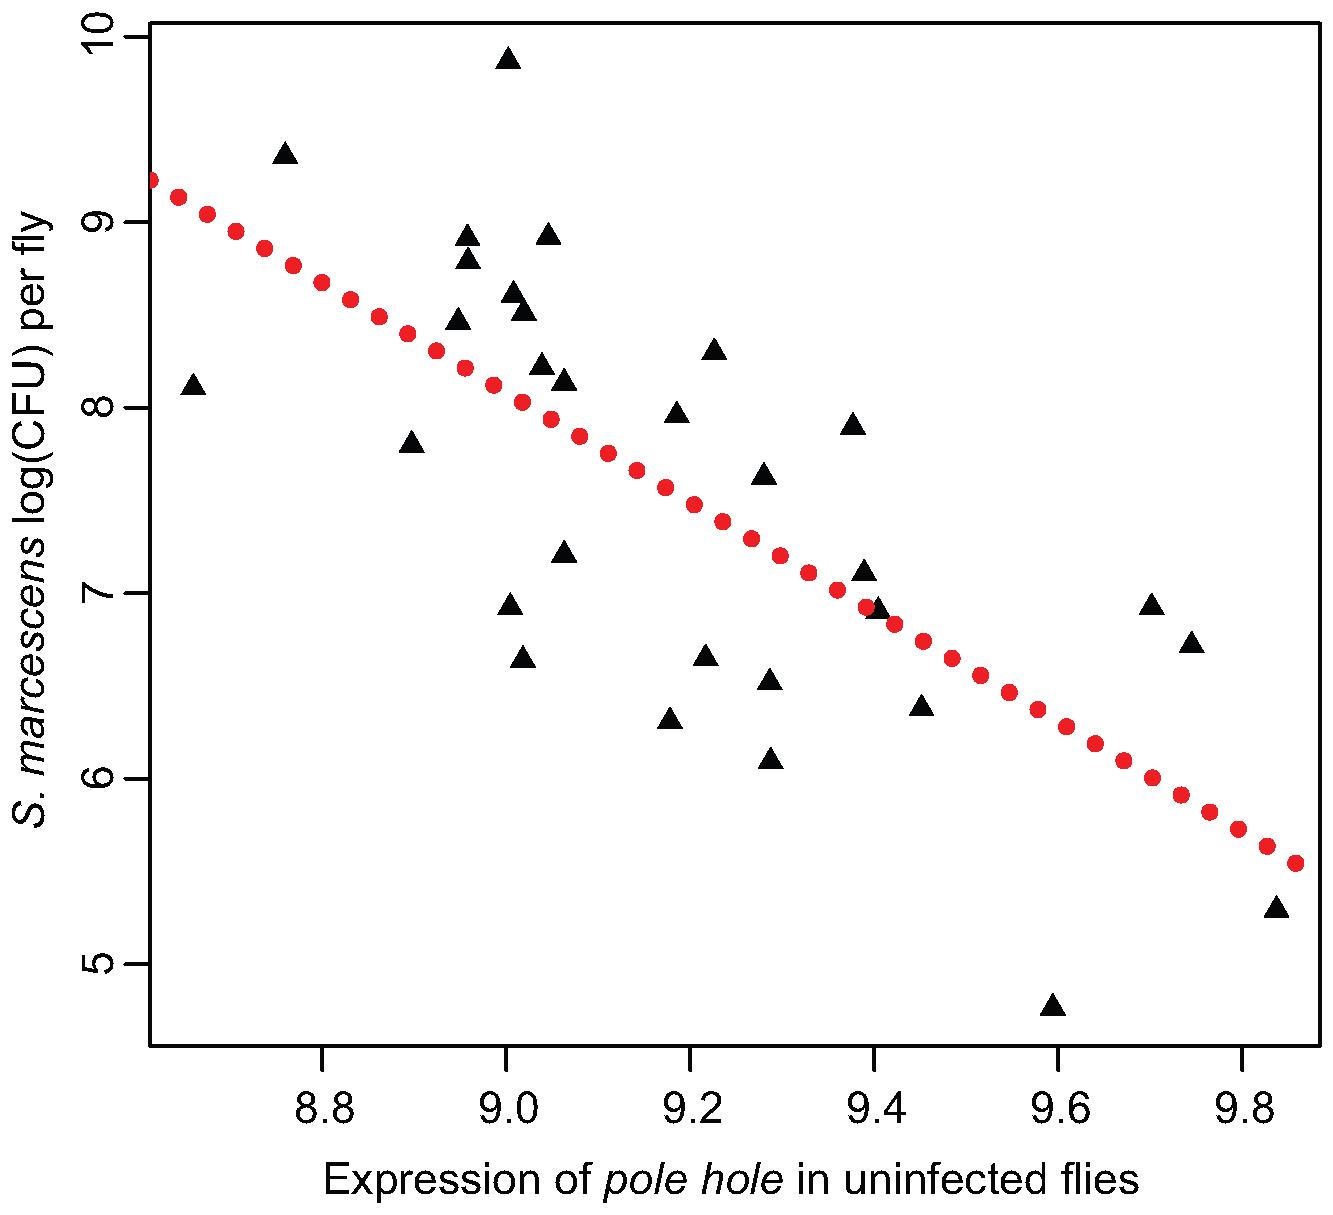 Expression of <i>pole hole</i> correlates with <i>S. marcescens</i> bacterial load.